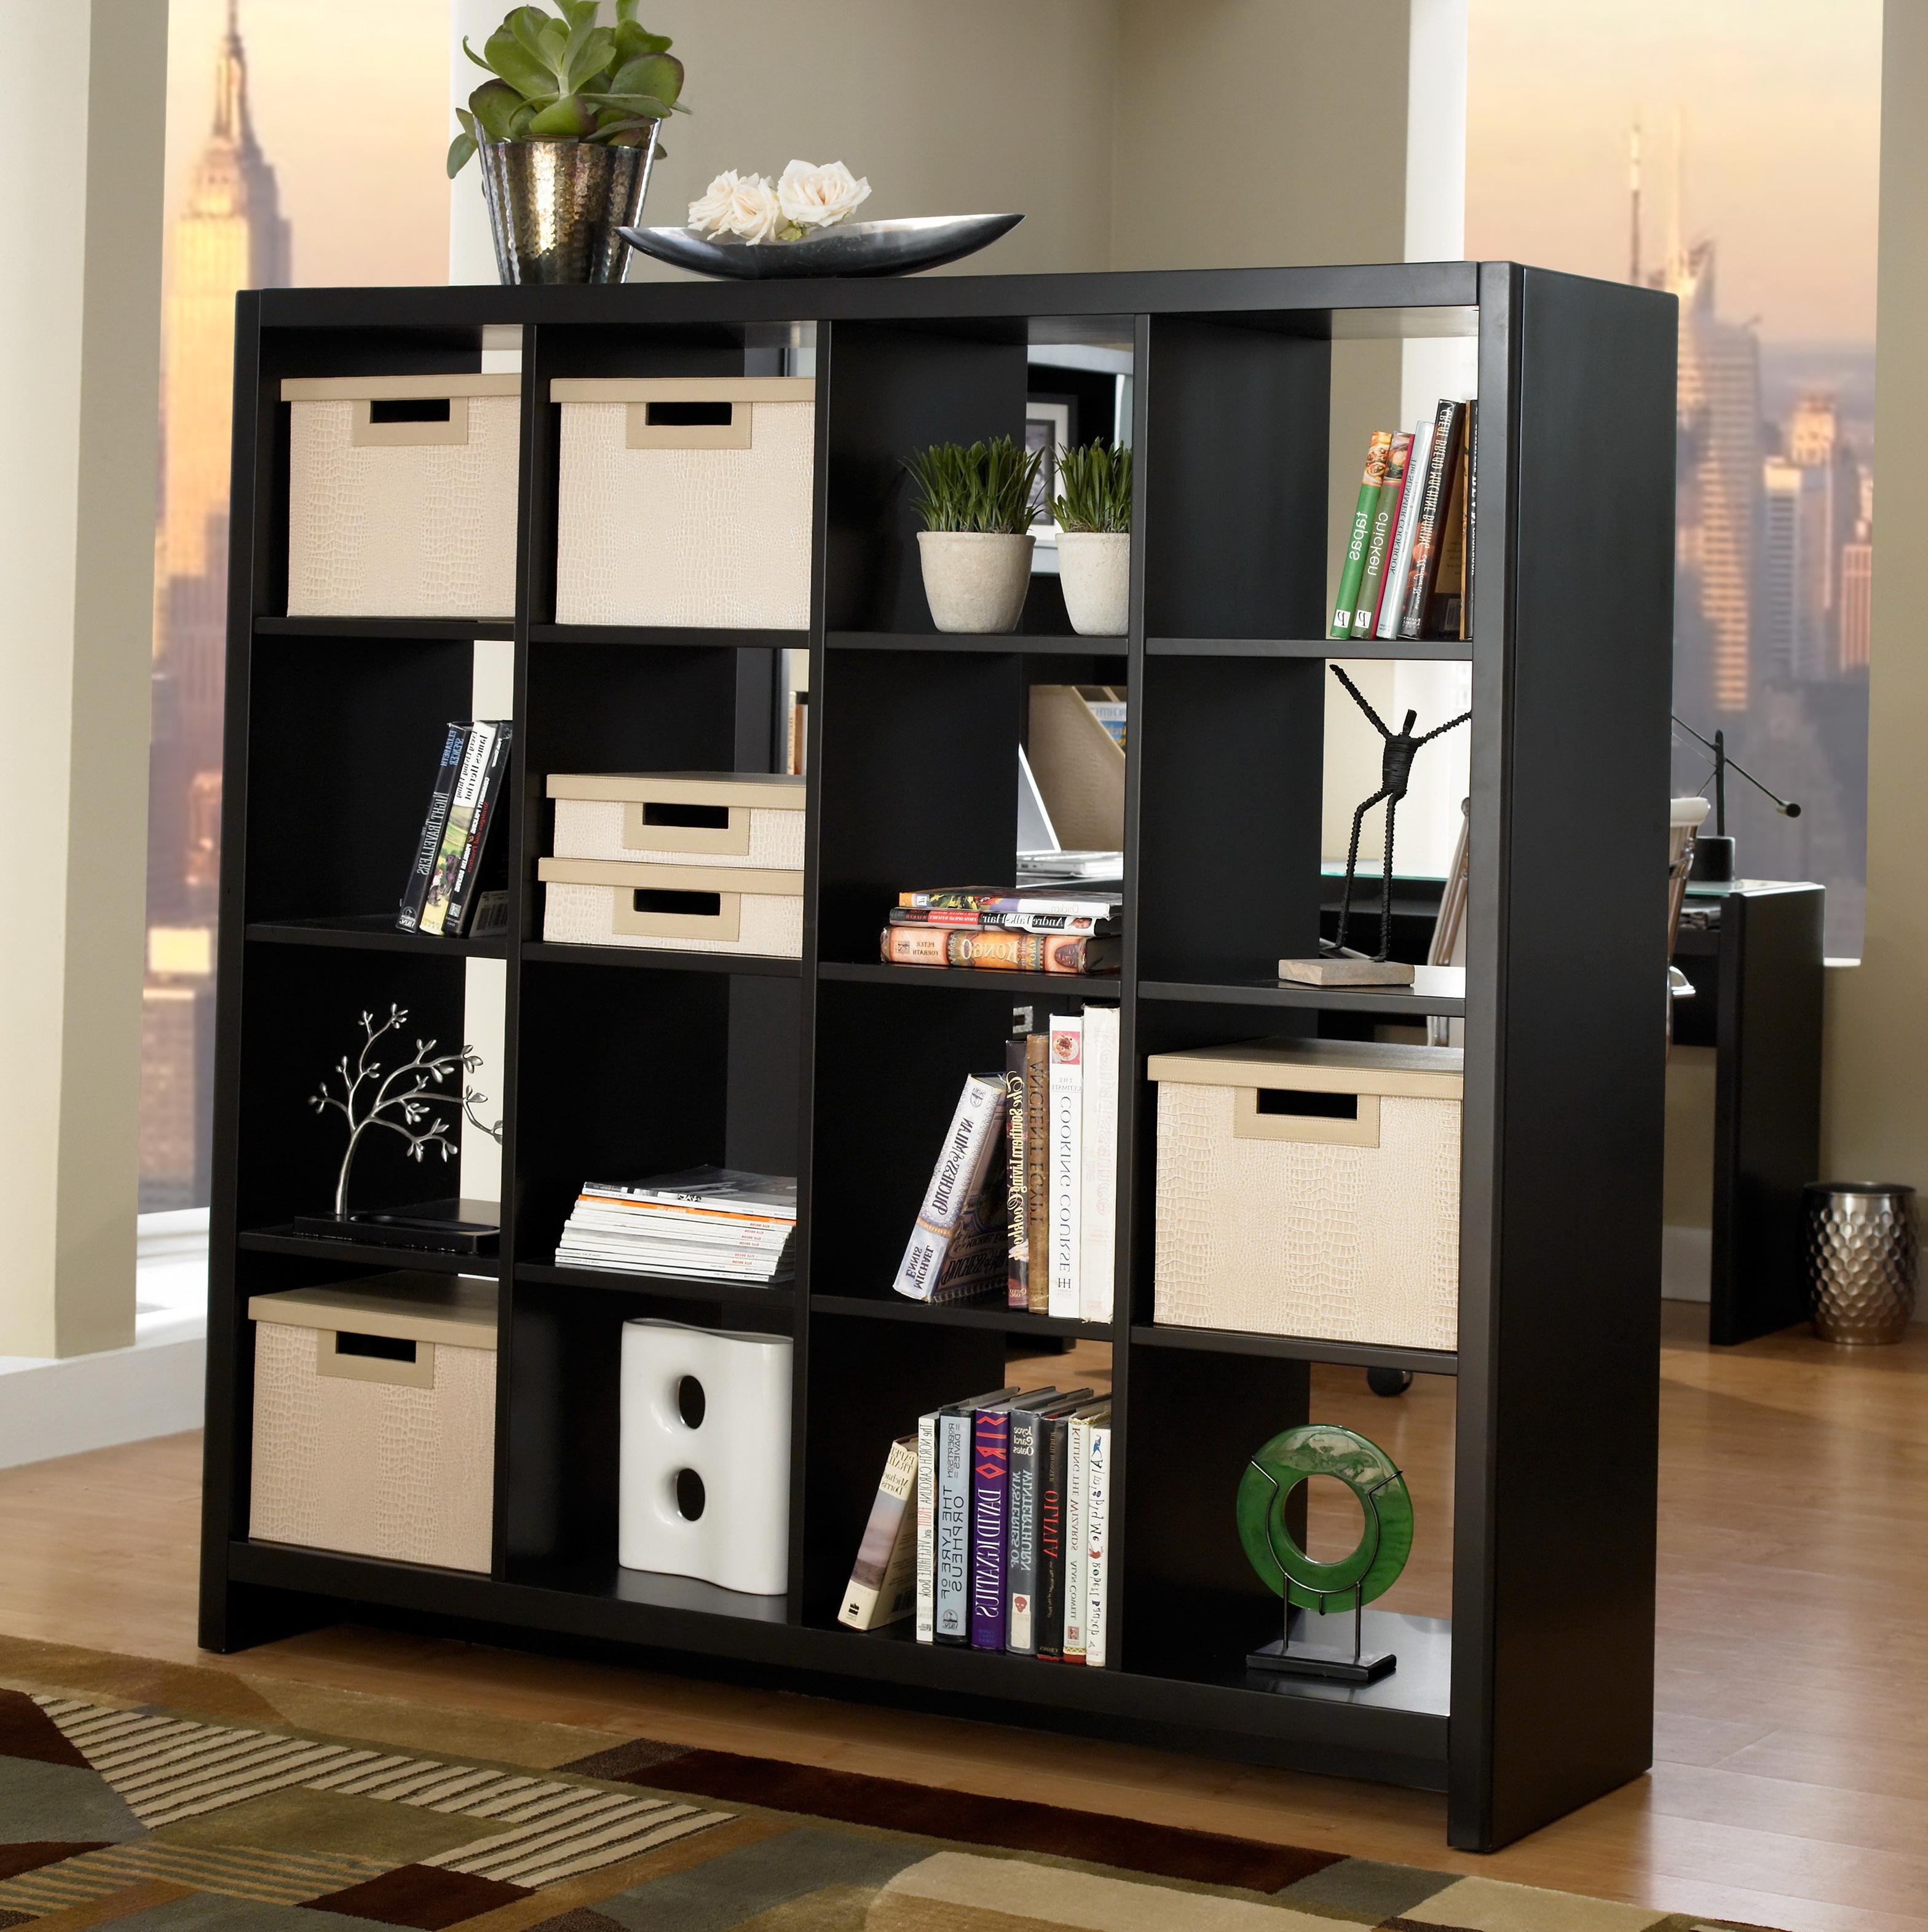 Permalink to Bookshelf Room Divider Ikea